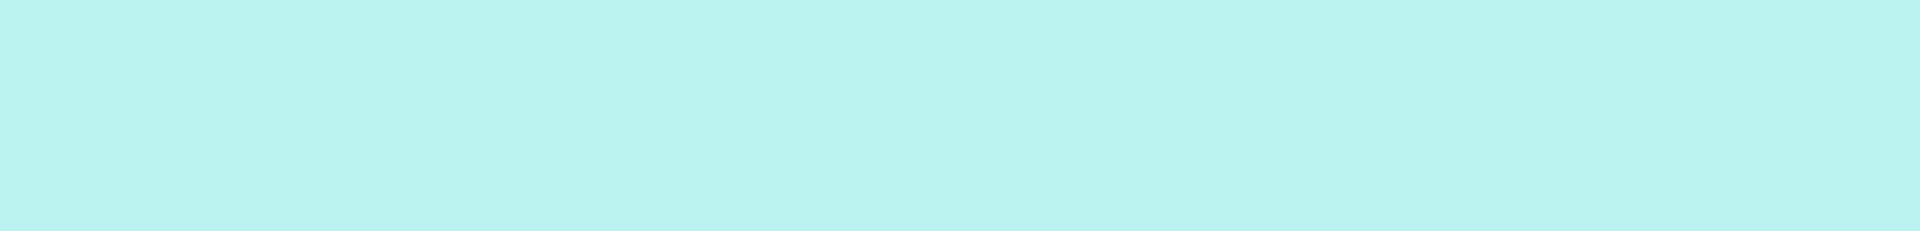 Belfort divider 3 1920